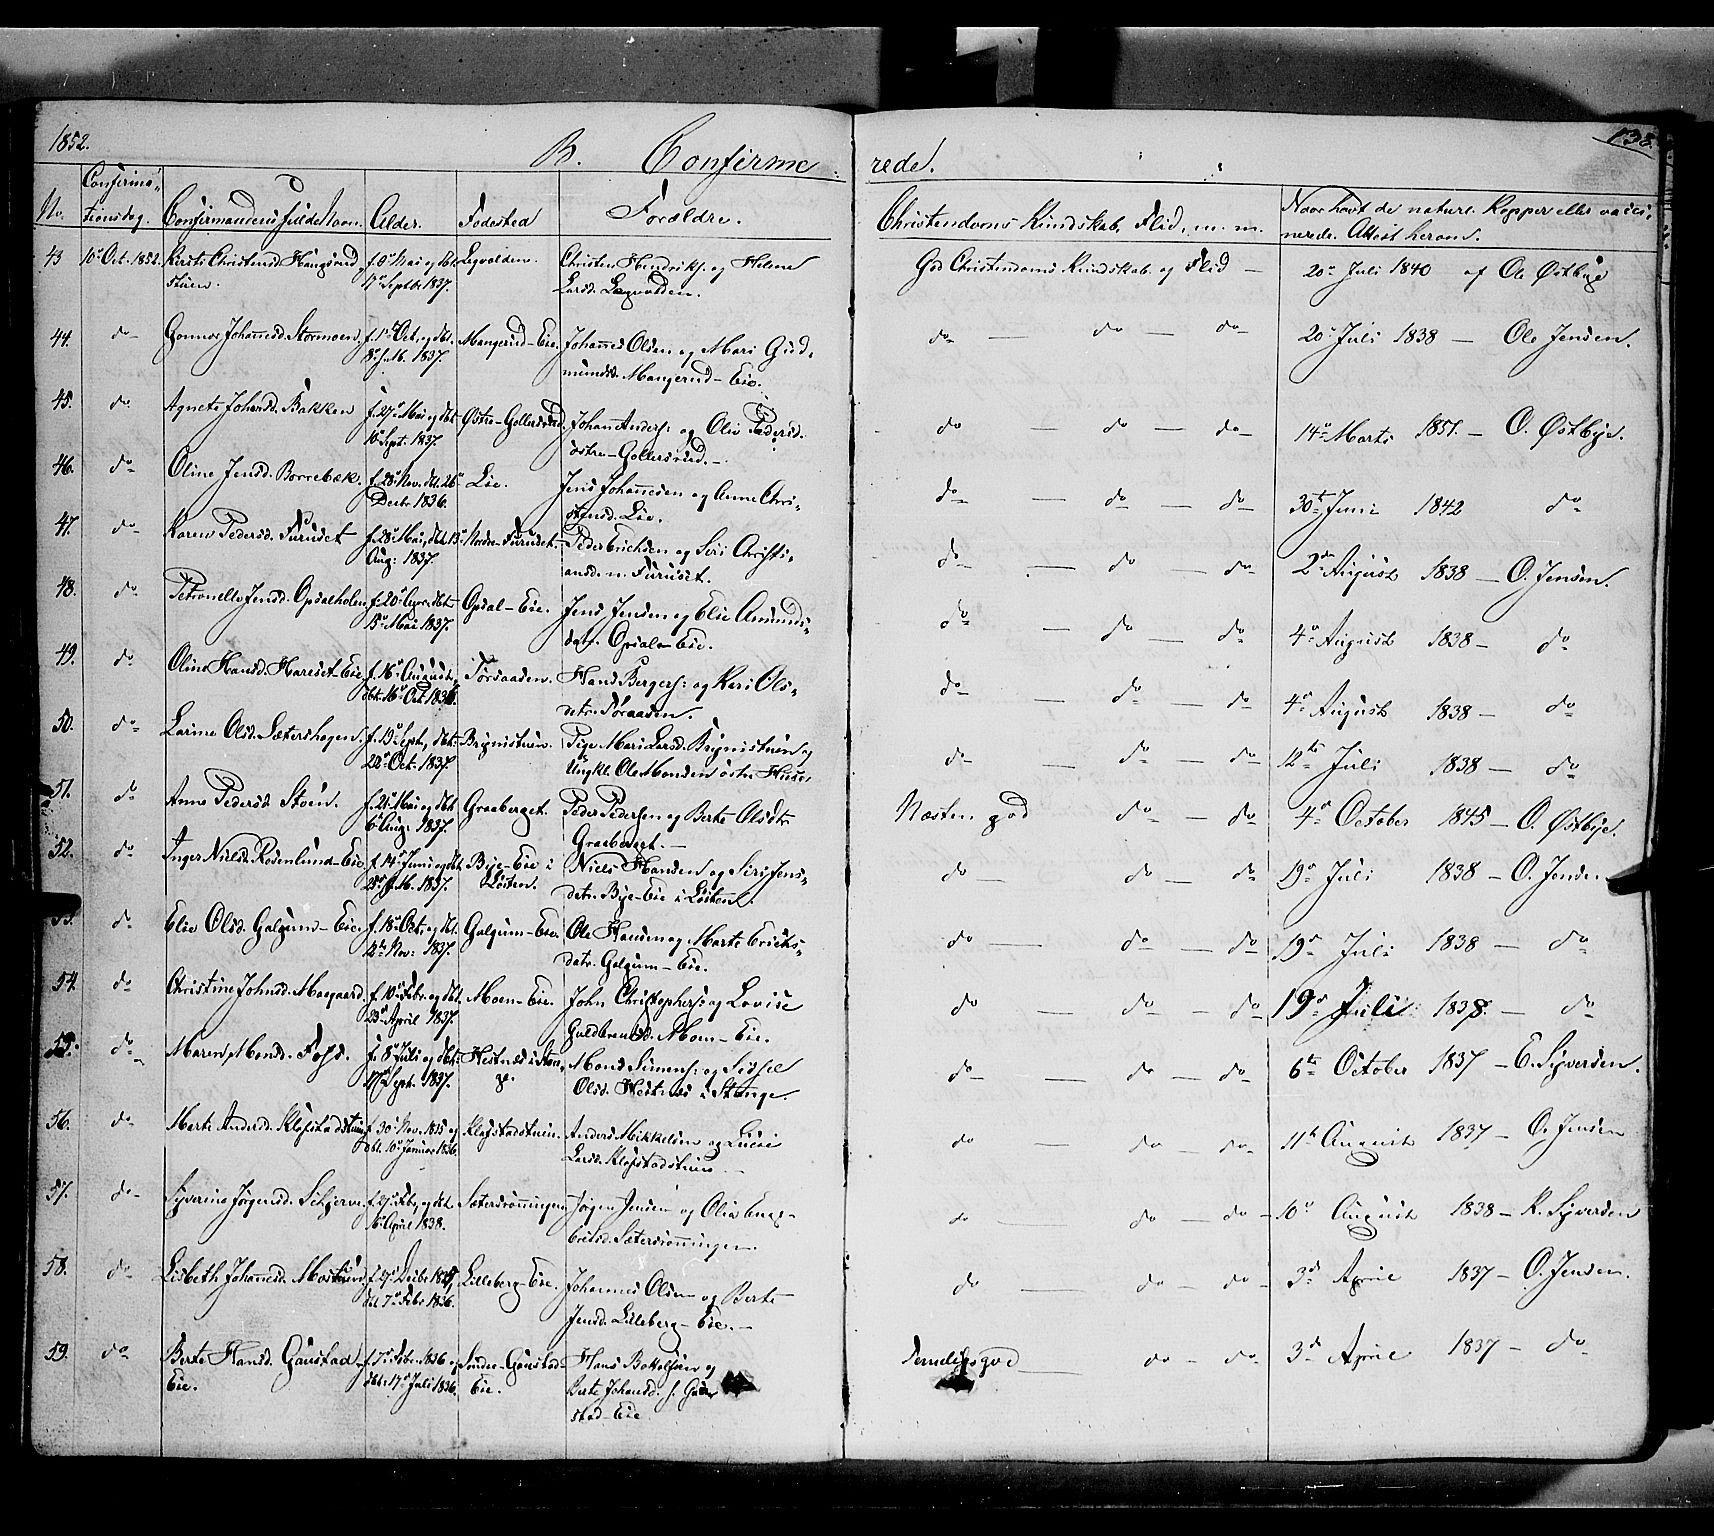 SAH, Romedal prestekontor, K/L0004: Ministerialbok nr. 4, 1847-1861, s. 138